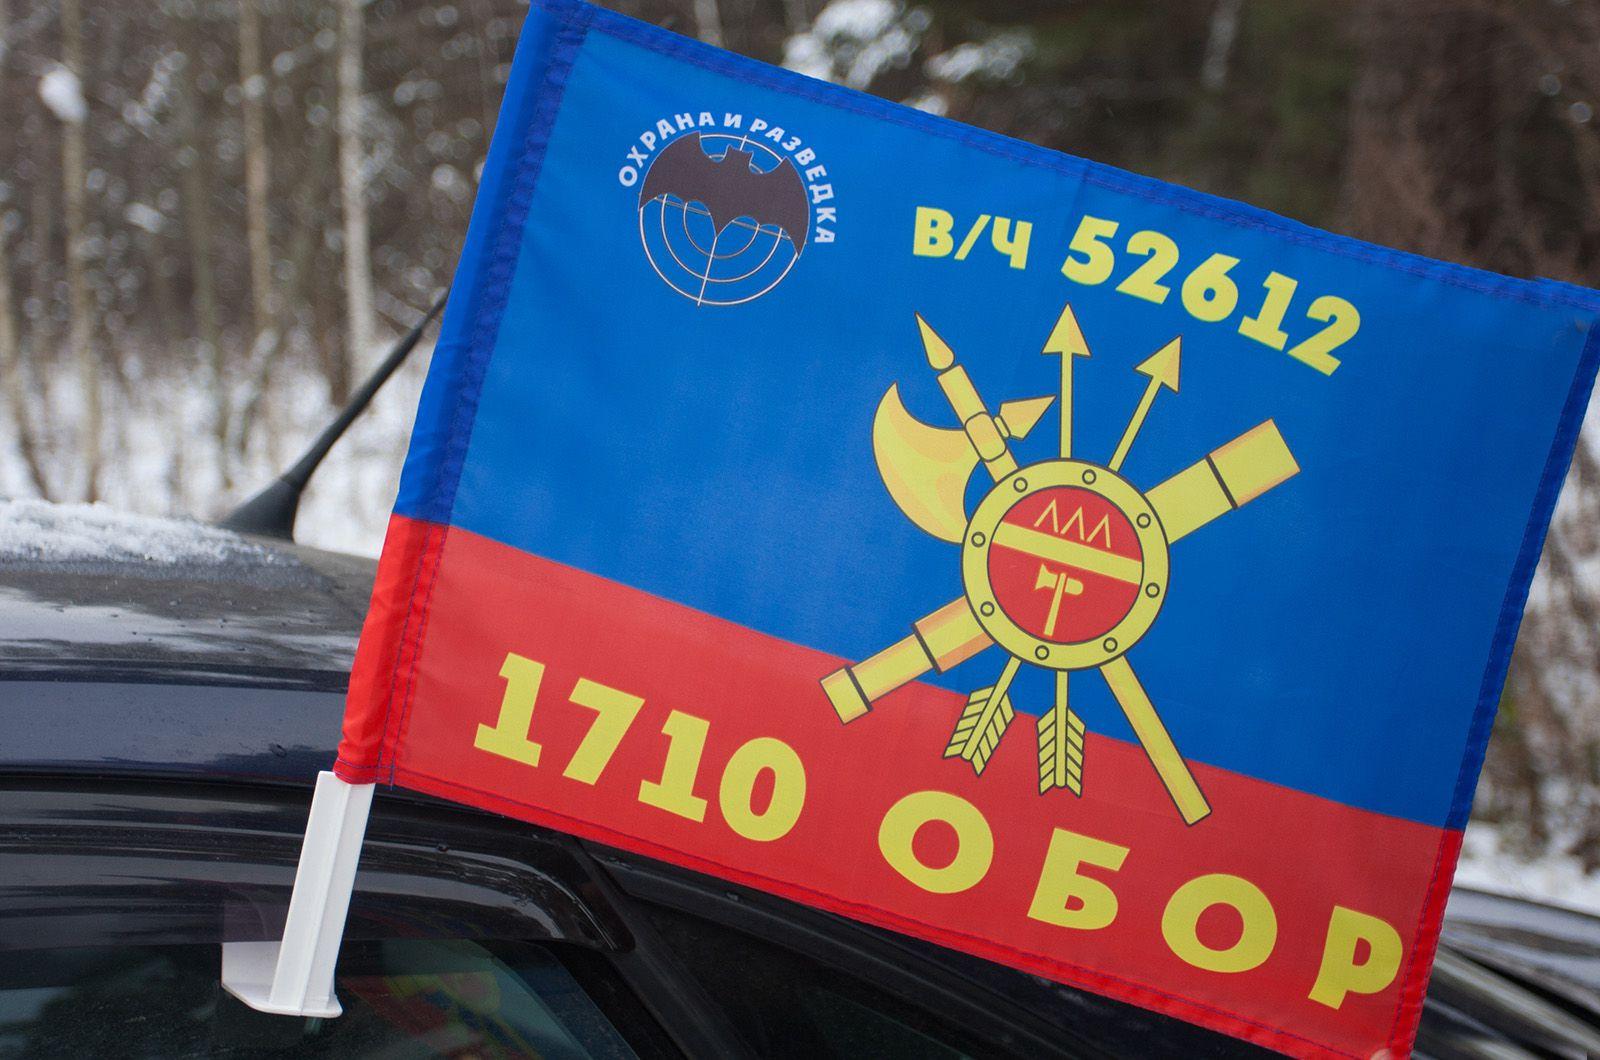 Автофлаг РВСН 1710 ОБОР